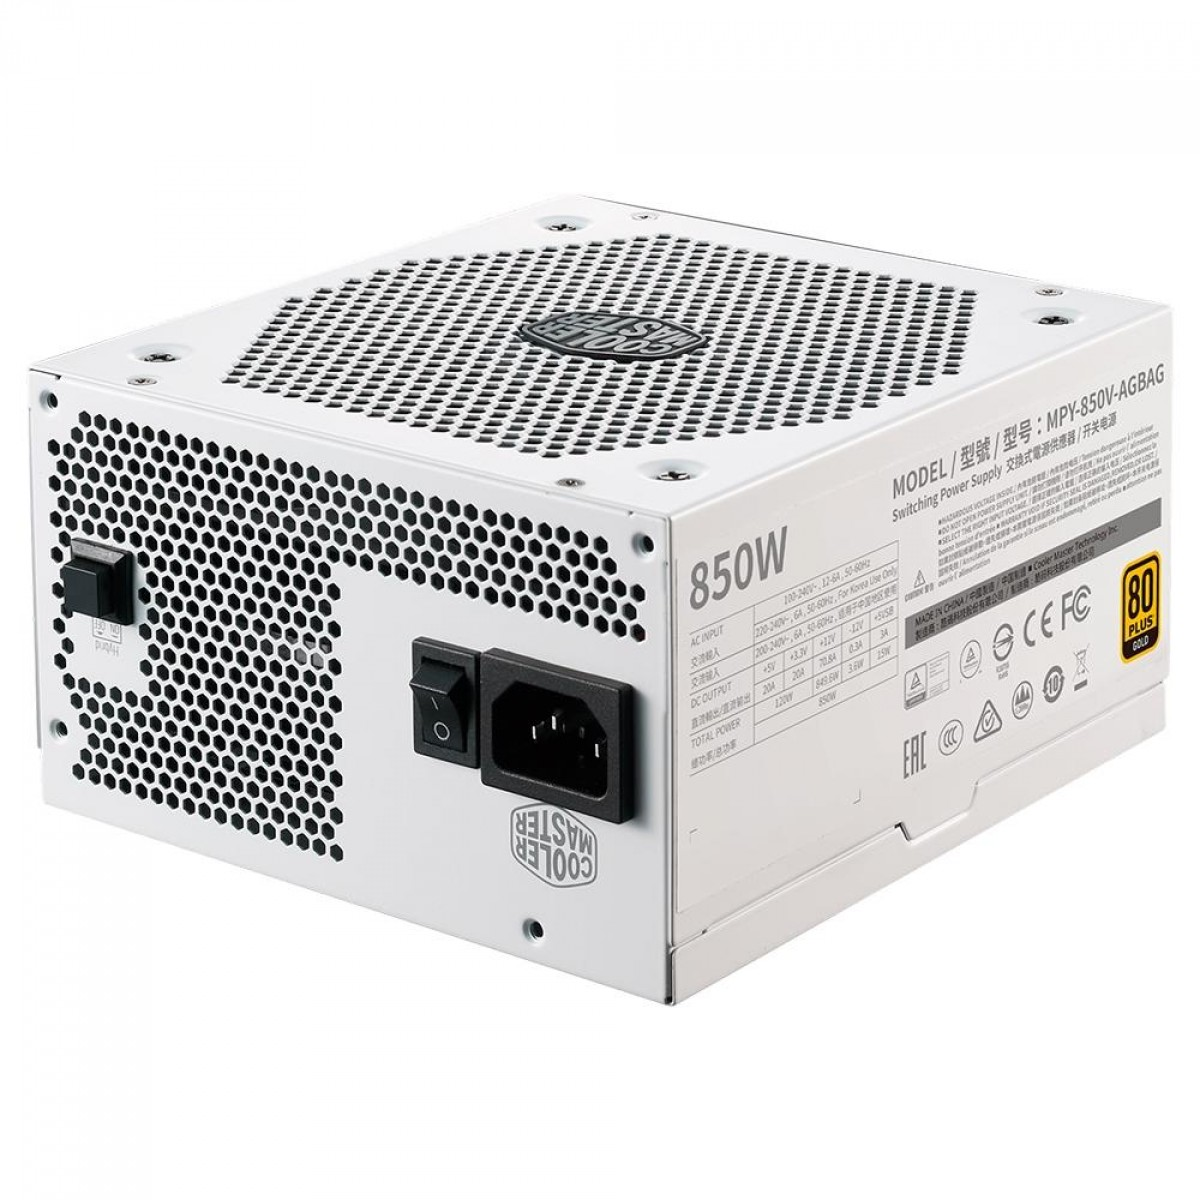 Fonte Cooler Master V850 V2 850W, 80 Plus Gold, PFC Ativo, Full Modular, MPY-850V-AGBAG-WO